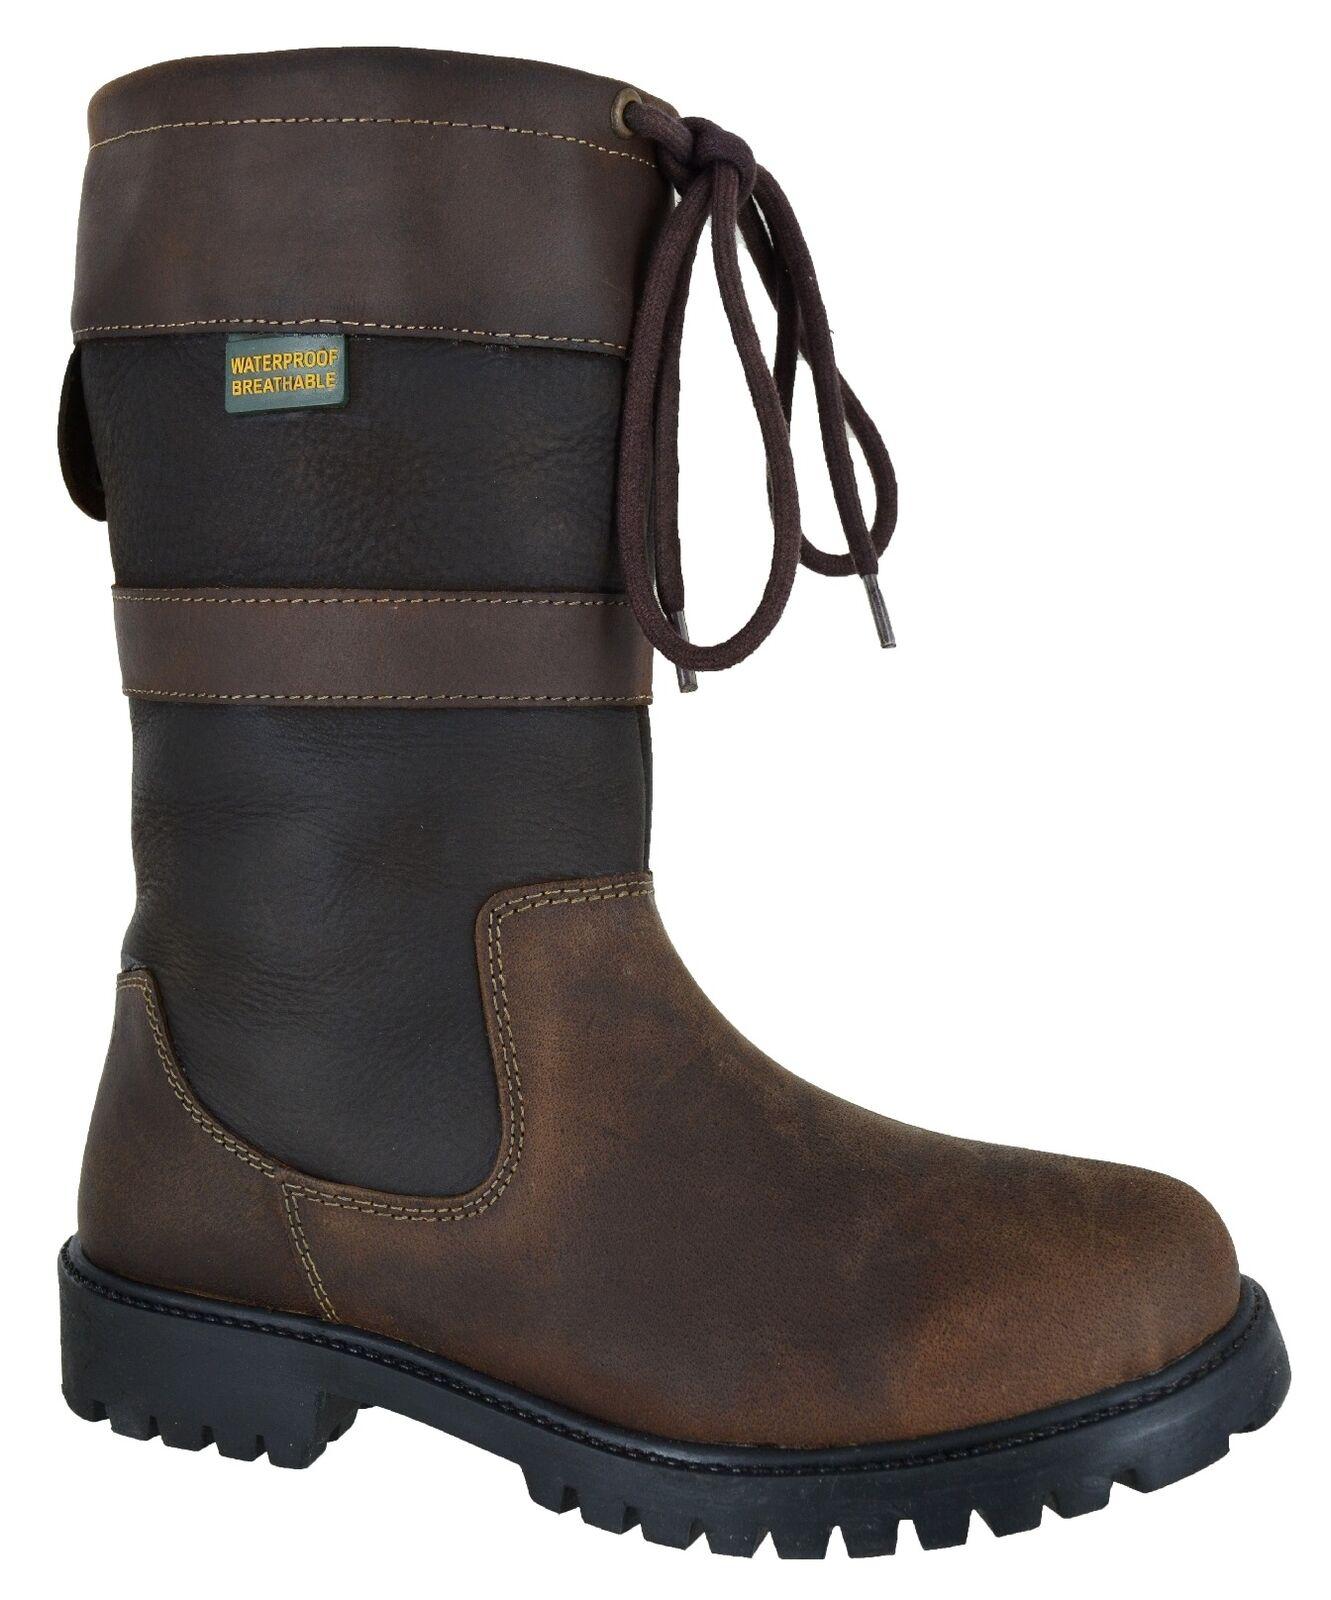 País De Montar a Caballo Confort De Las Señoras De Cuero Inteligente Casual Zapatos botas Impermeable Talla